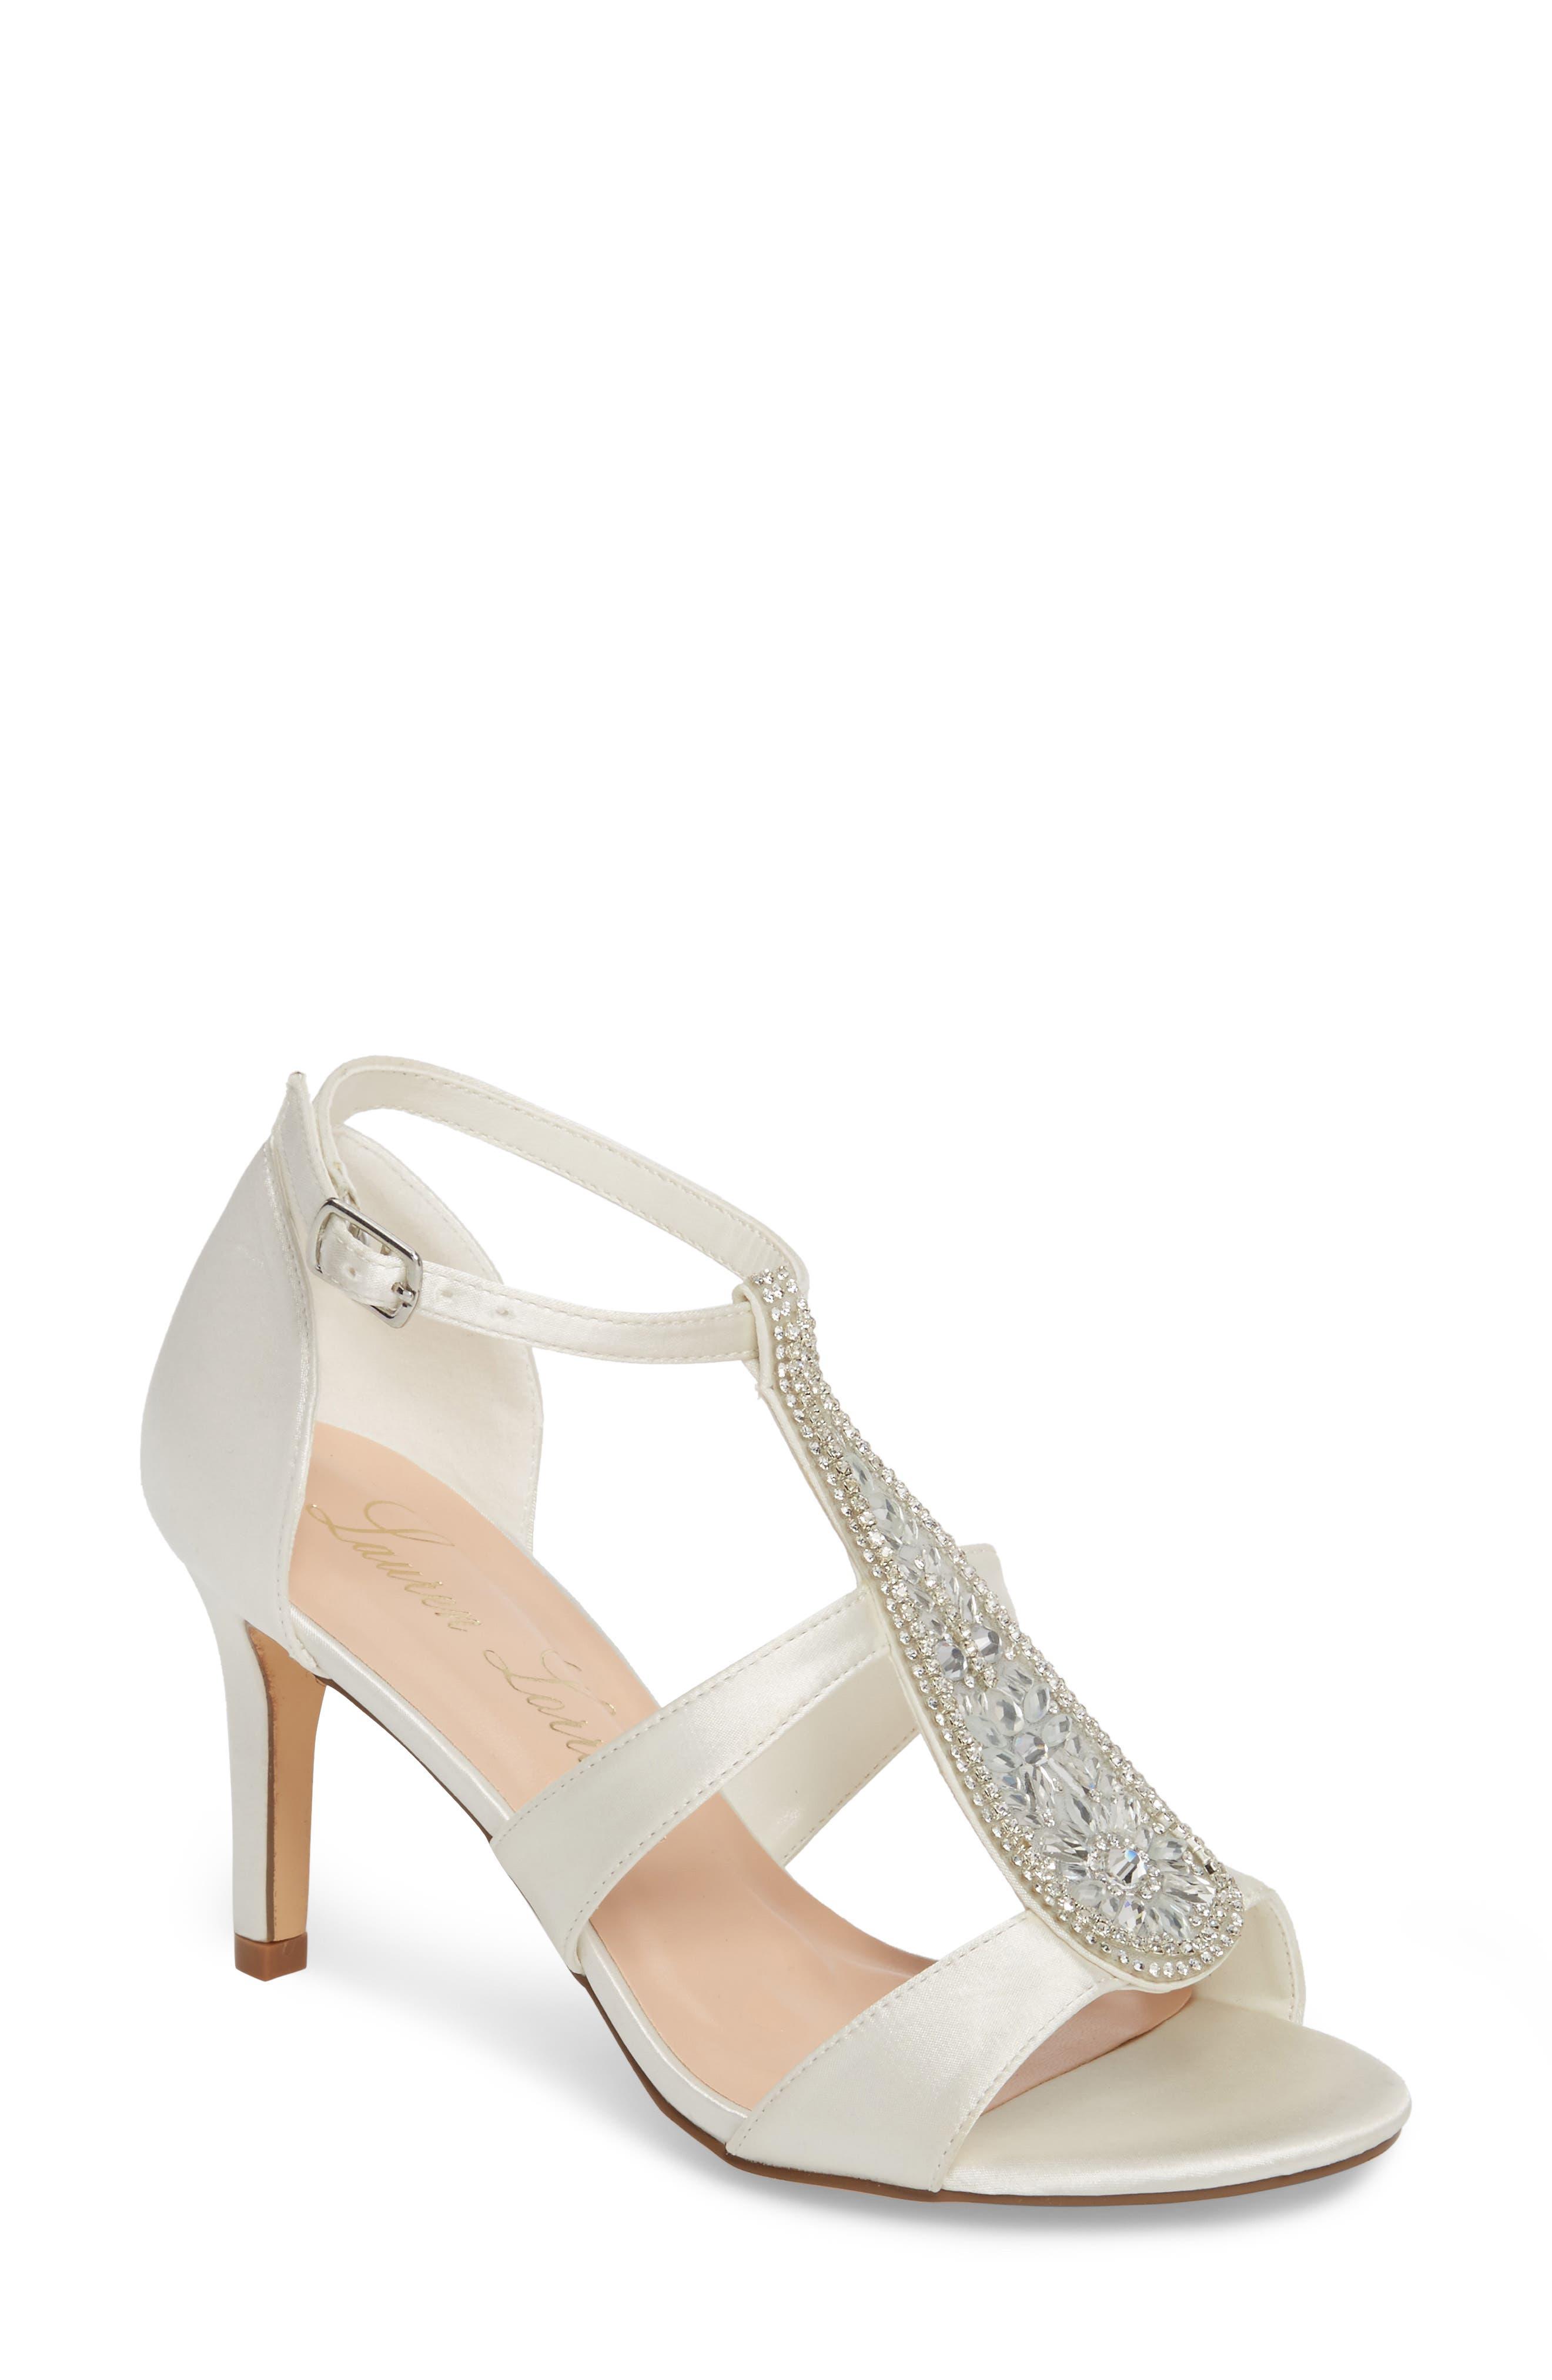 Lauren Lorraine Ritz Crystal Embellished Sandal- White